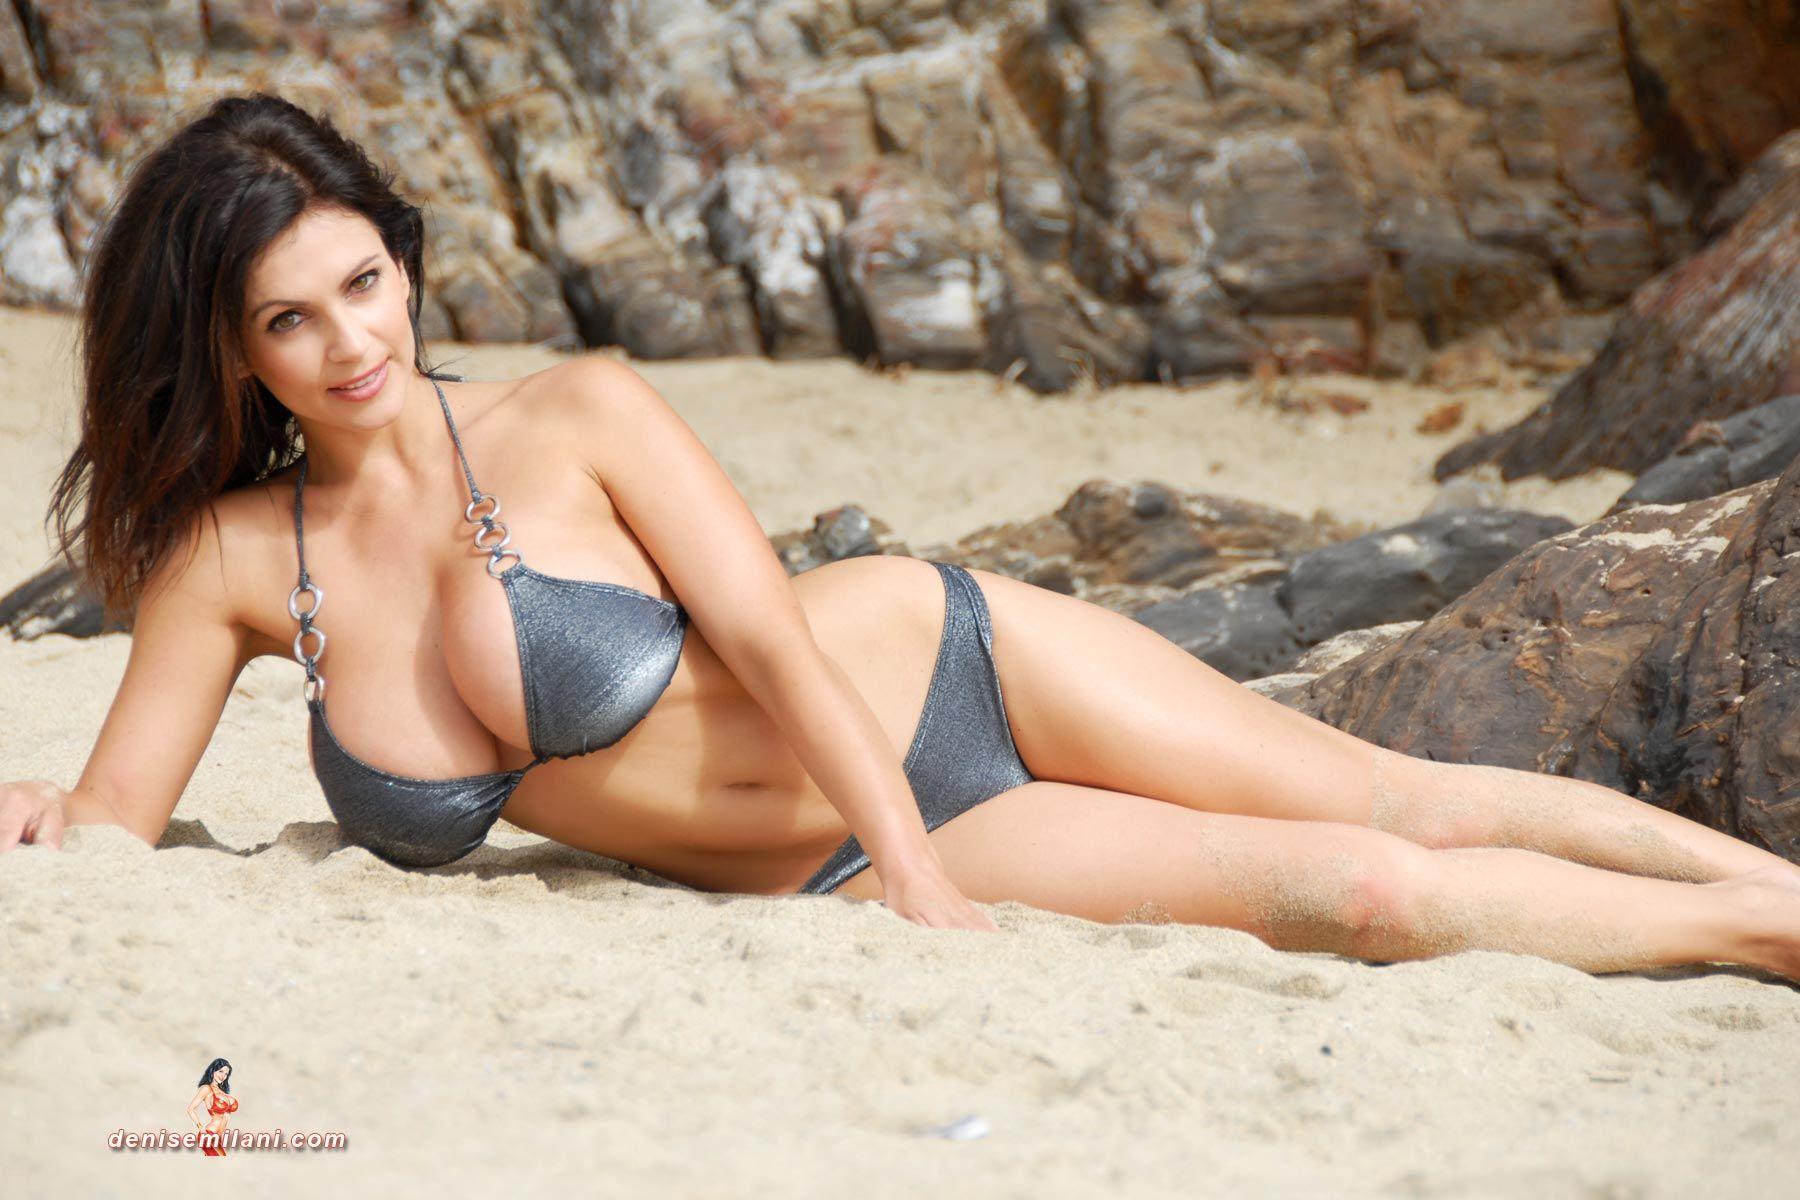 Denise milani silver bikini